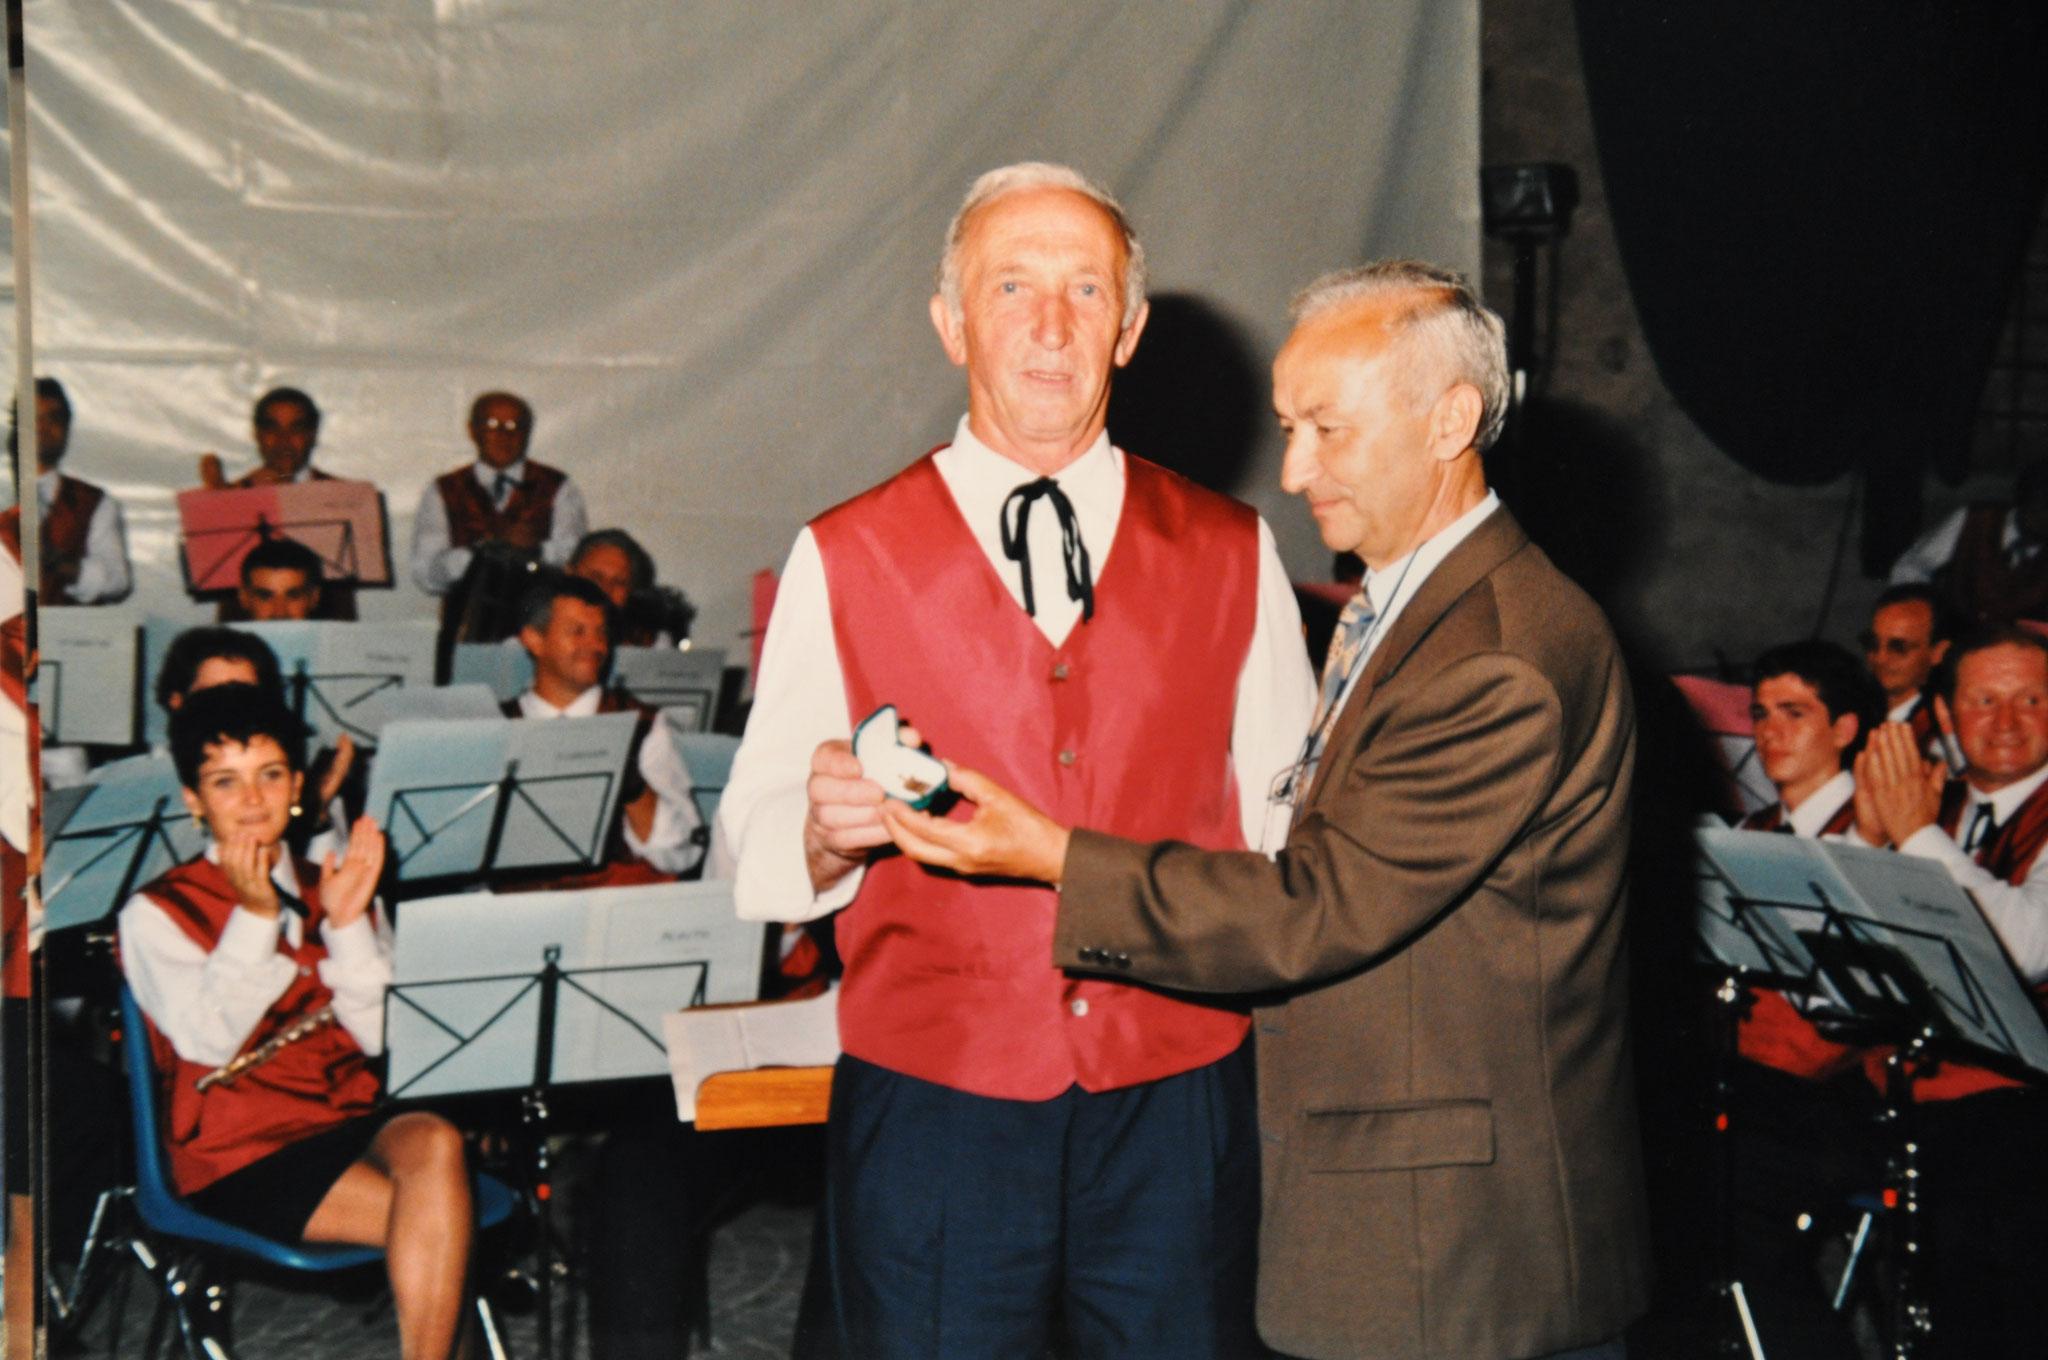 1997 Consegna targa ad Alfredo Tarolli